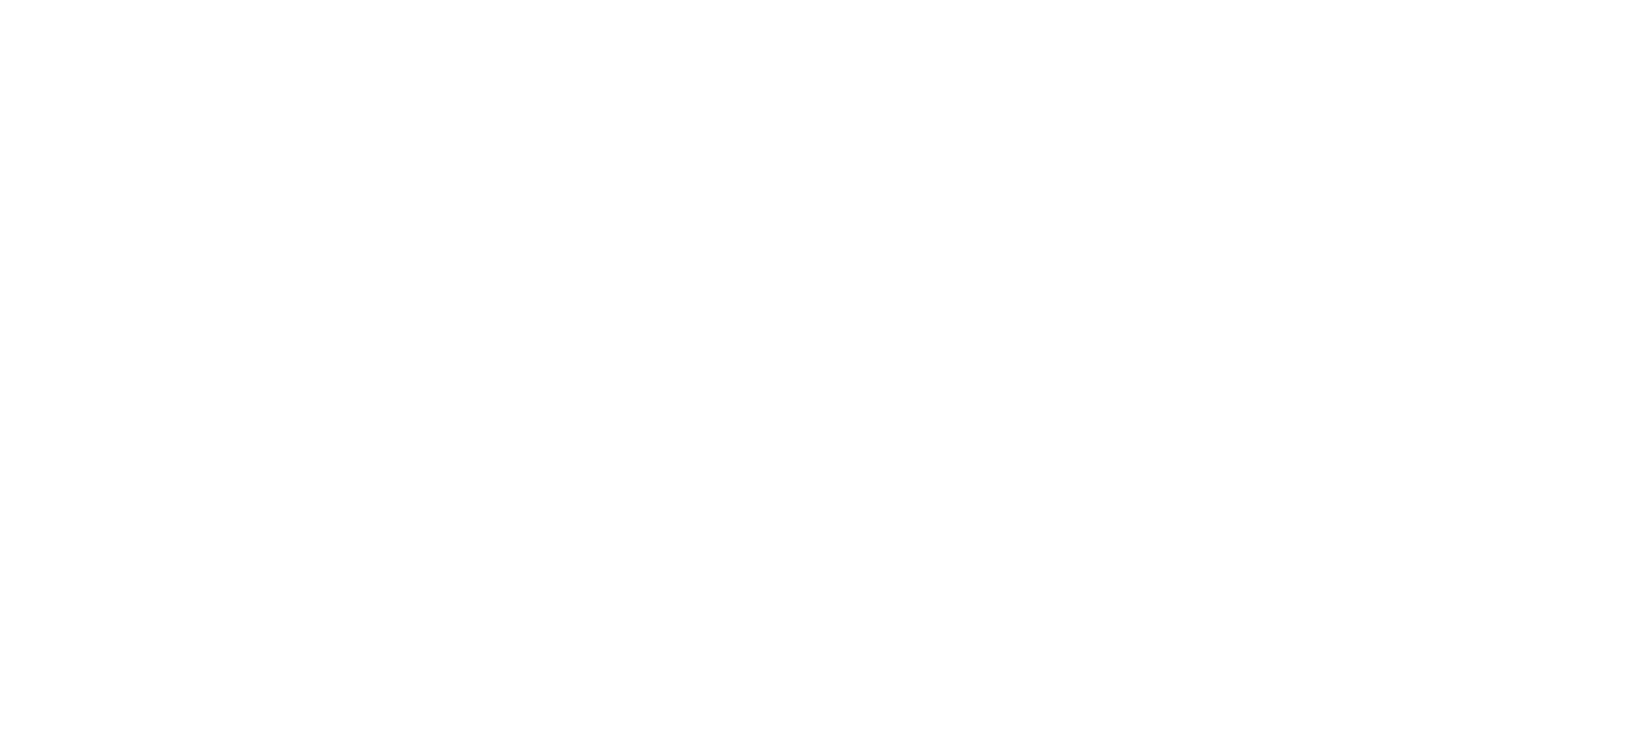 grafik_leistung_desktop.png